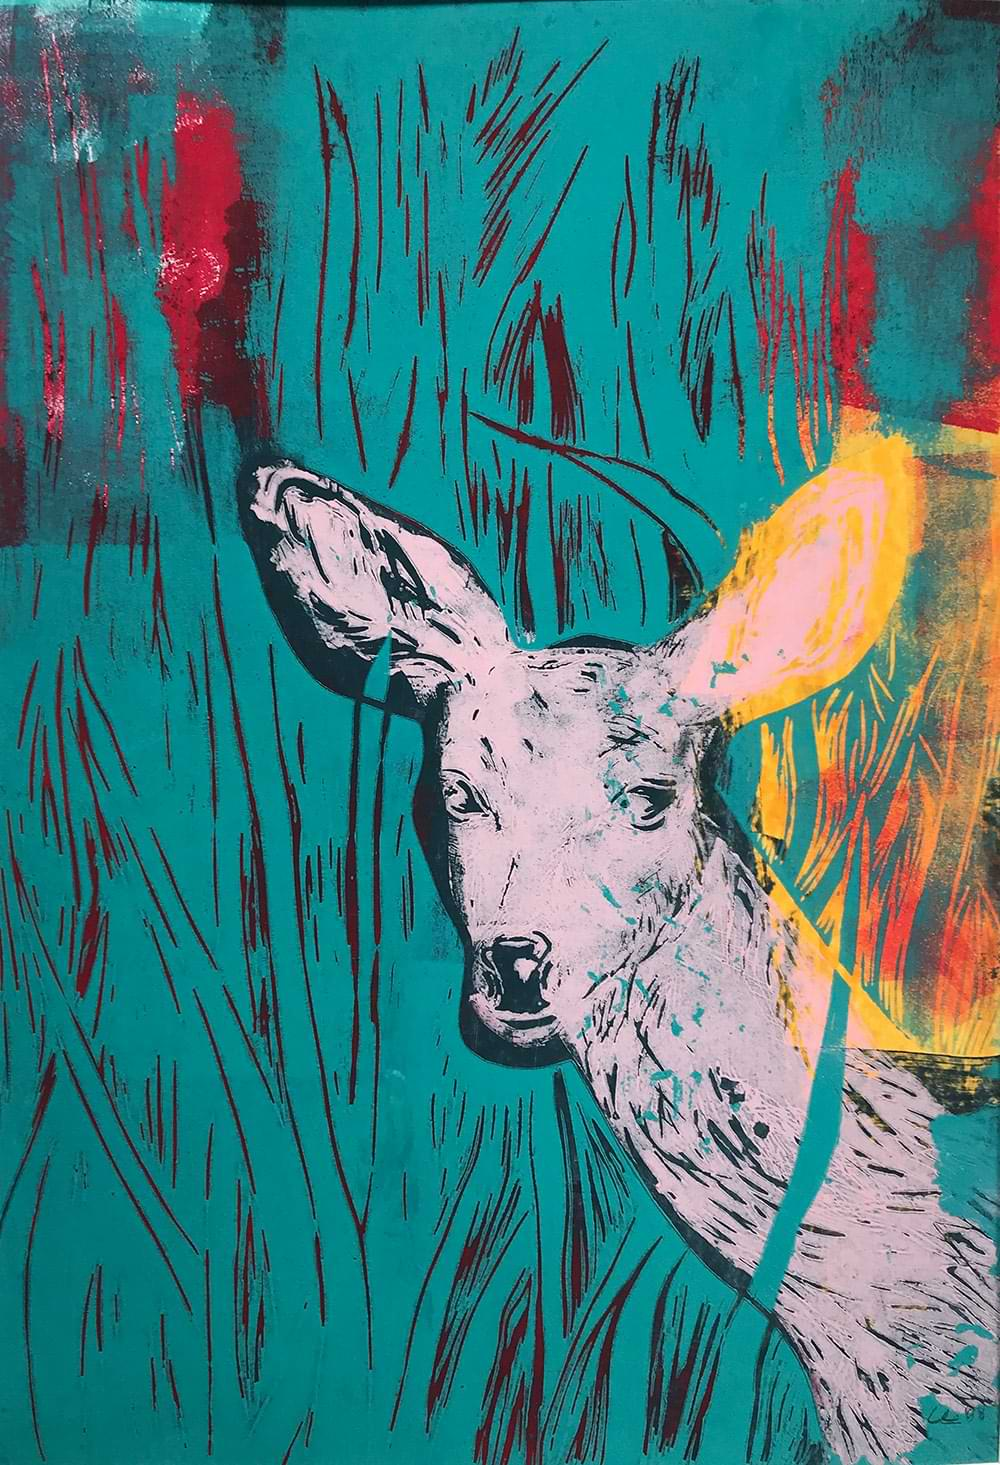 christiane haag kuenstlerin printmaking linoprint urbandeer urbannature art